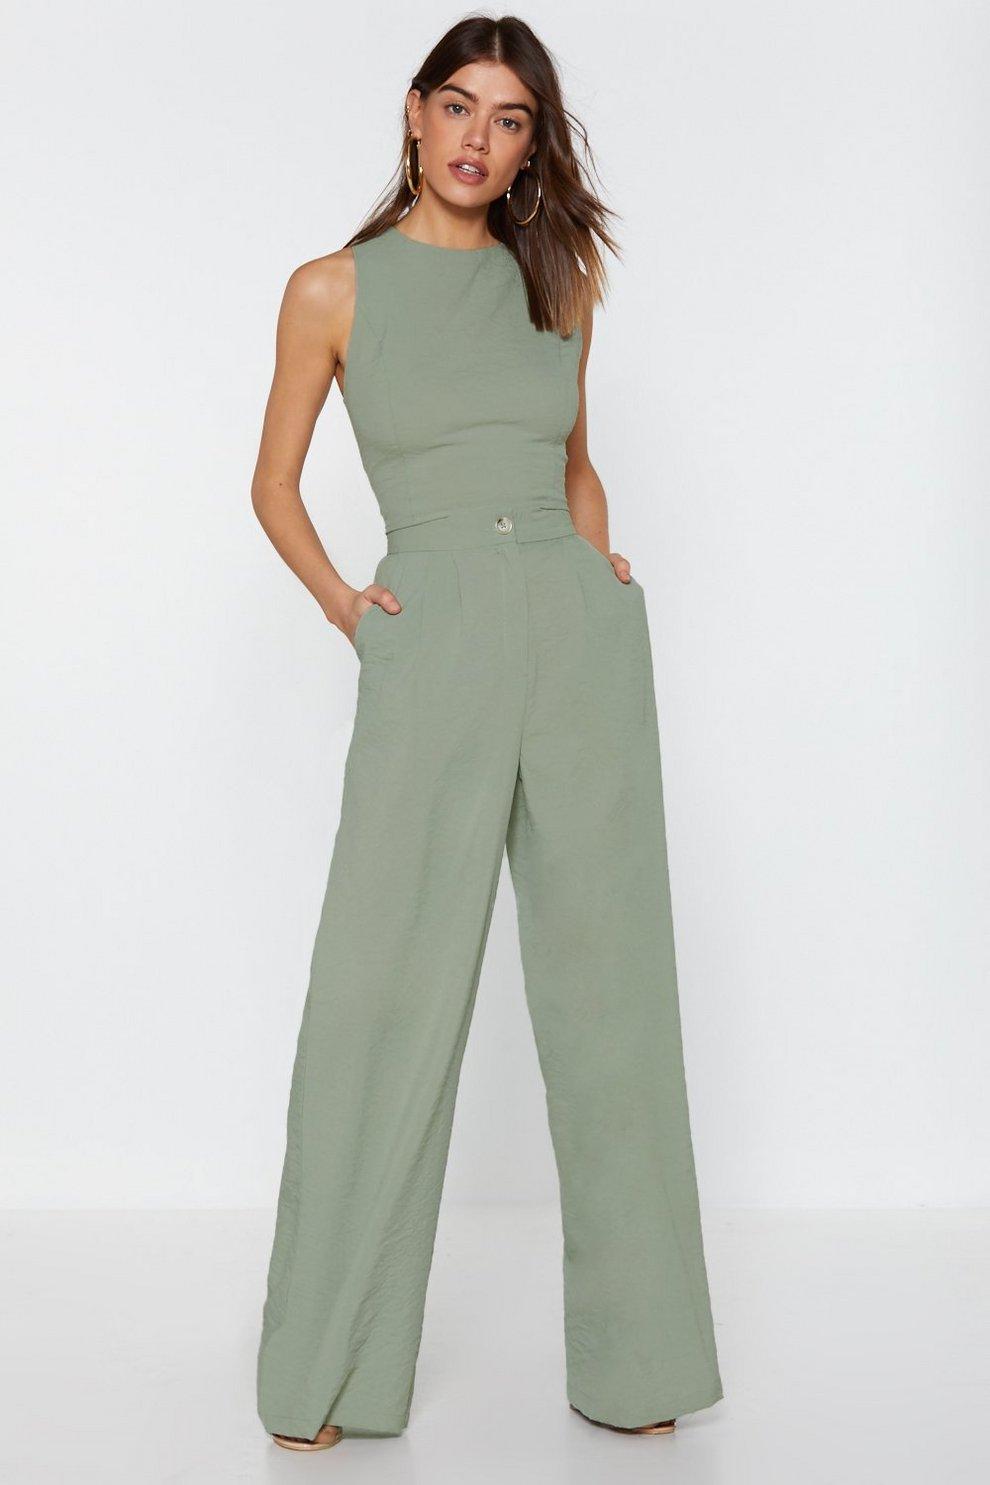 3e0750f8e9 Wide Leg High Waisted Pants